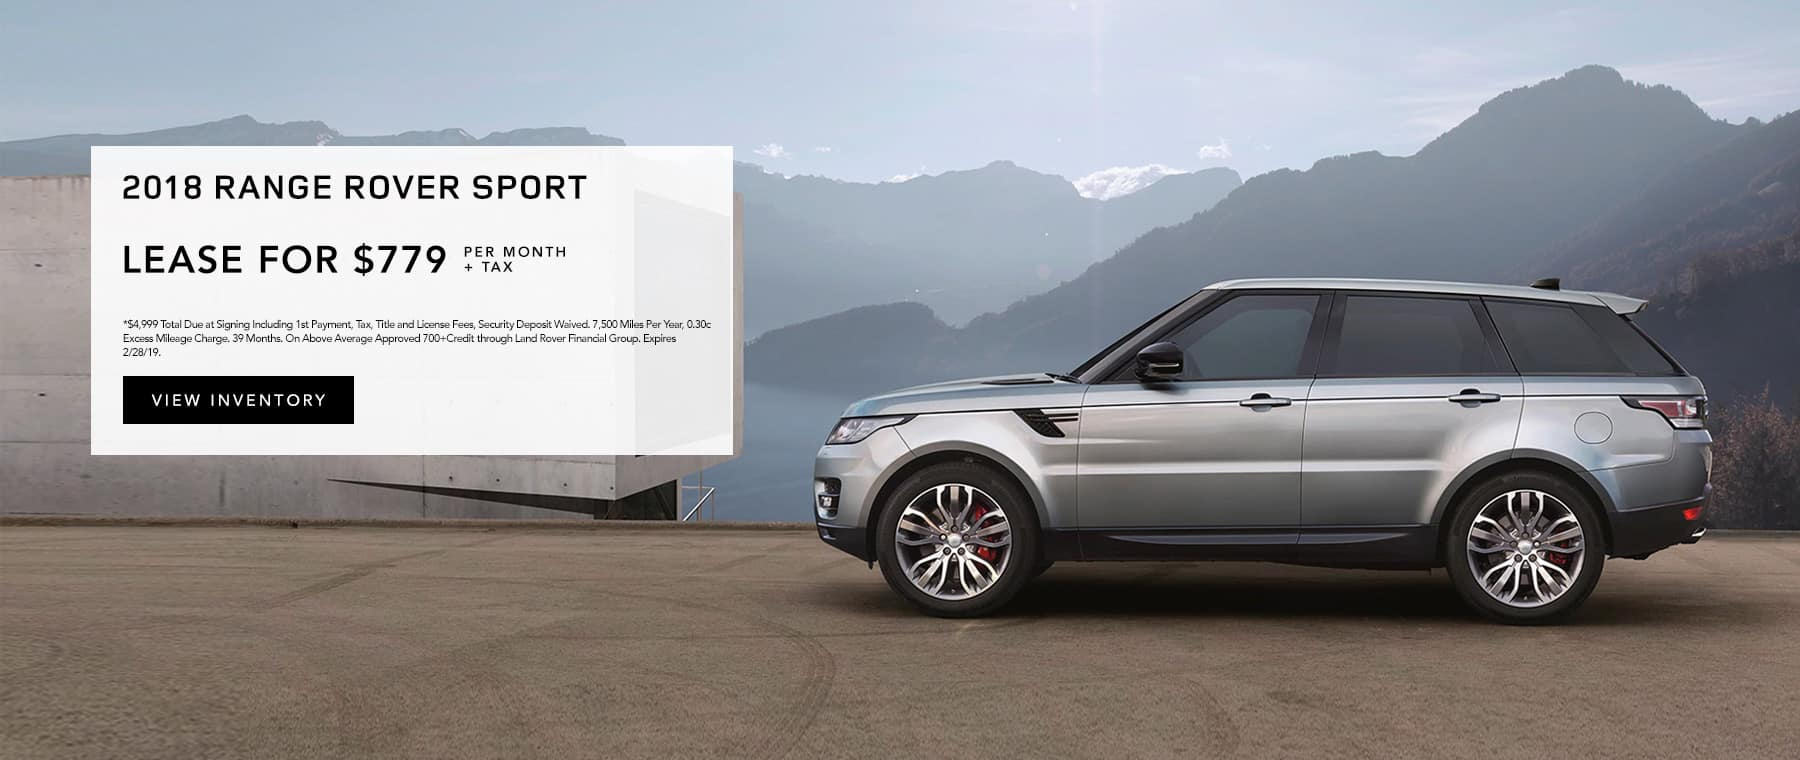 Land Rover Los Angeles >> Land Rover Dealer In West Hollywood Ca Hornburg Land Rover Los